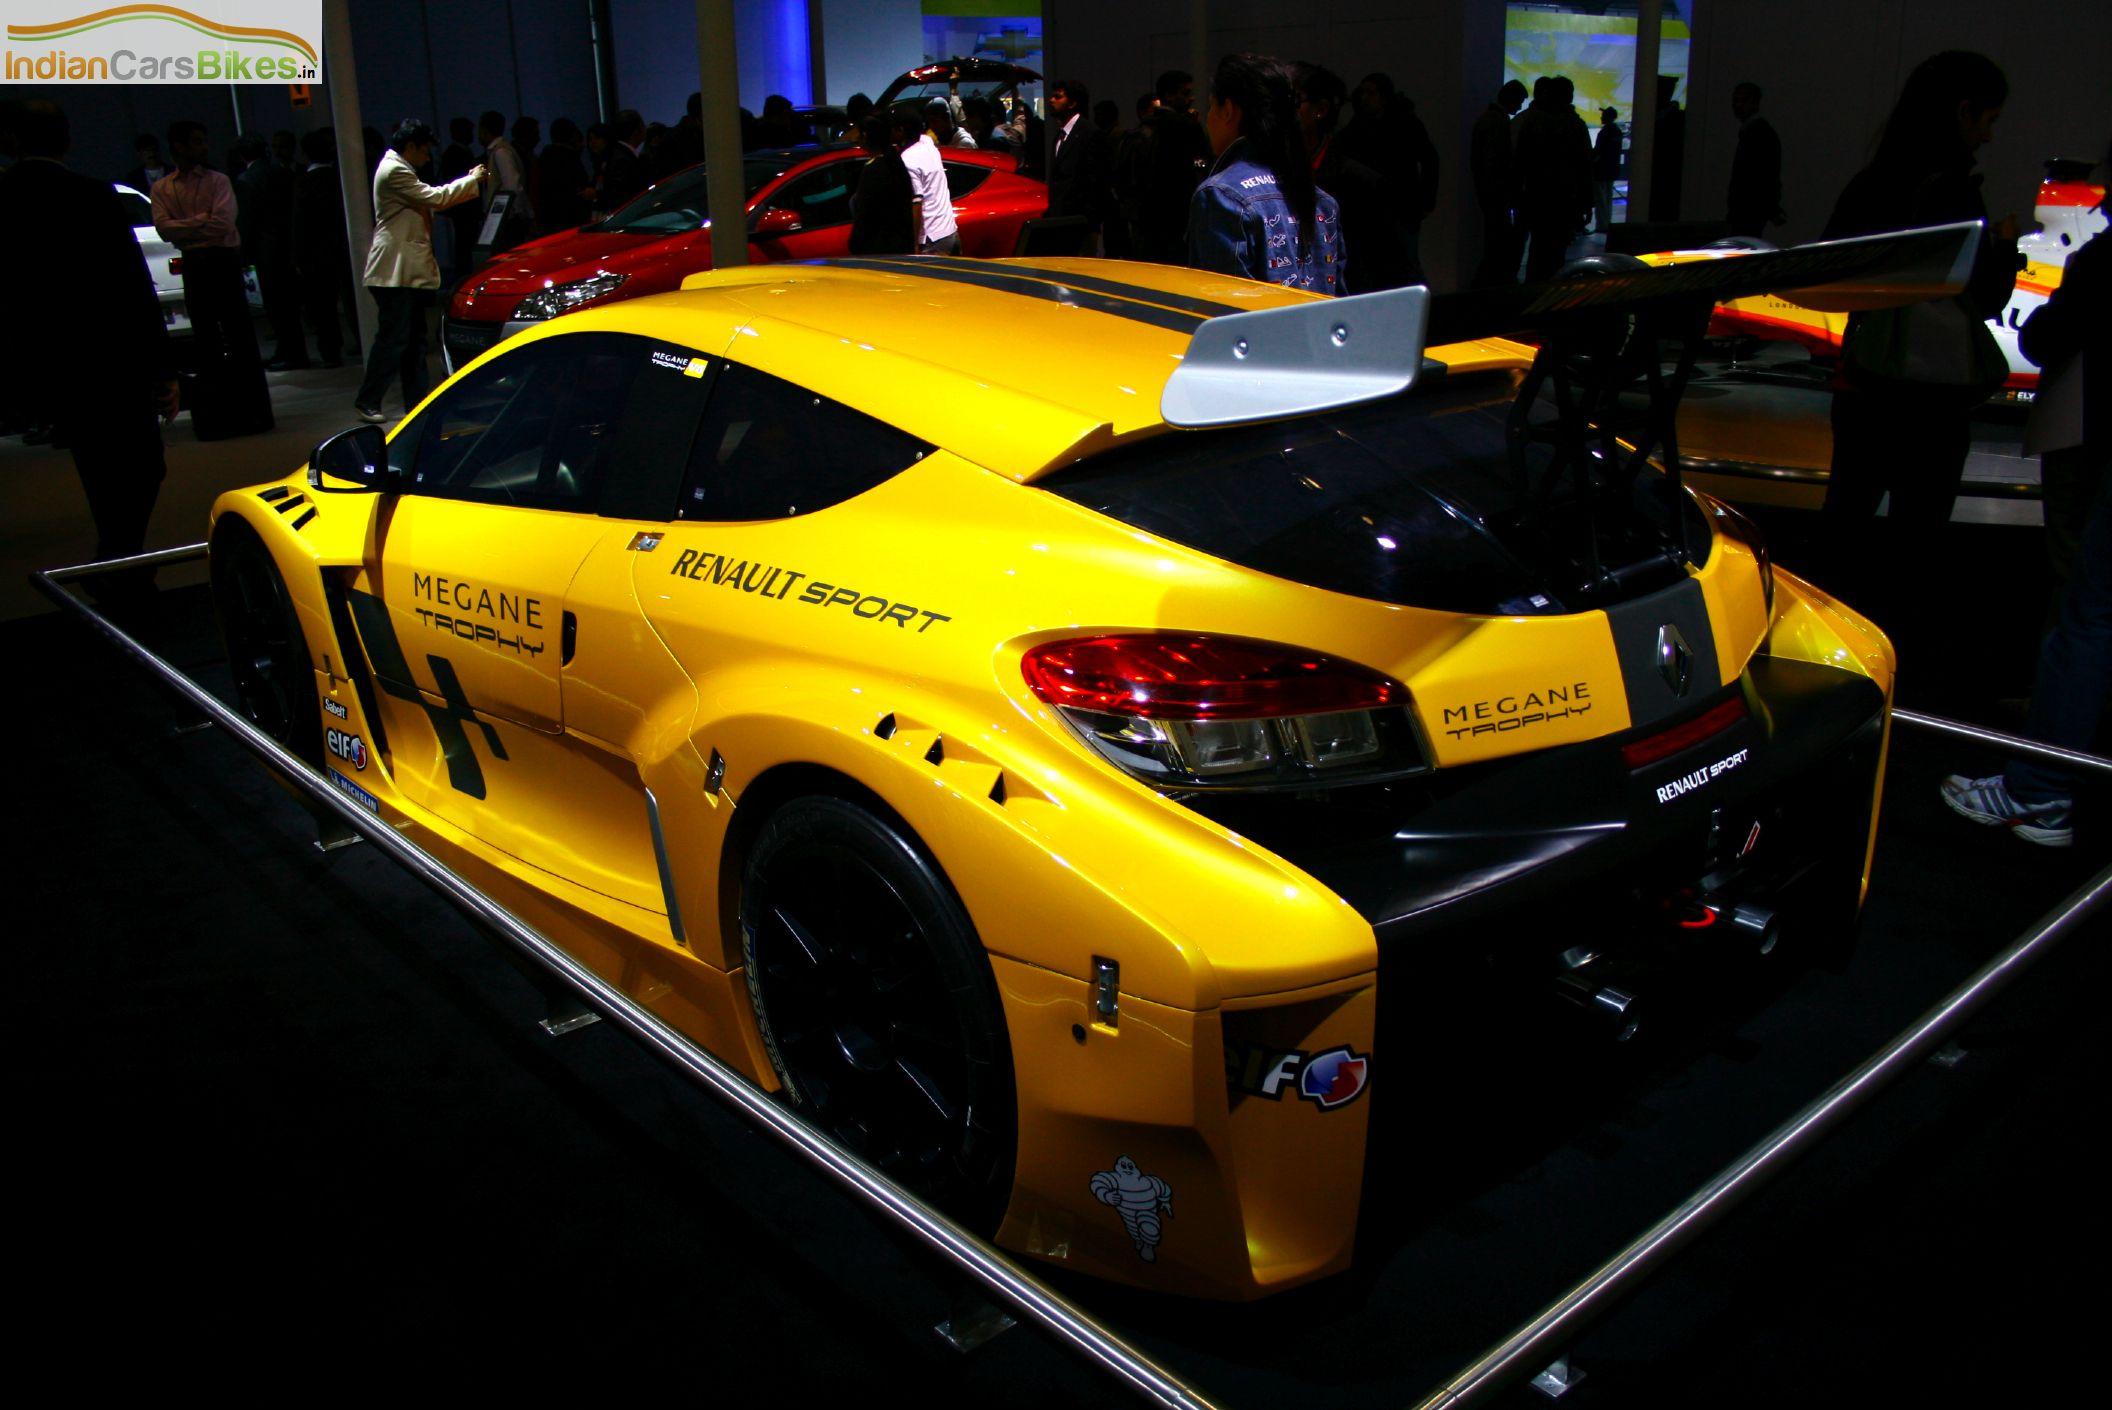 Attrayant Renault Megane Trophy Car